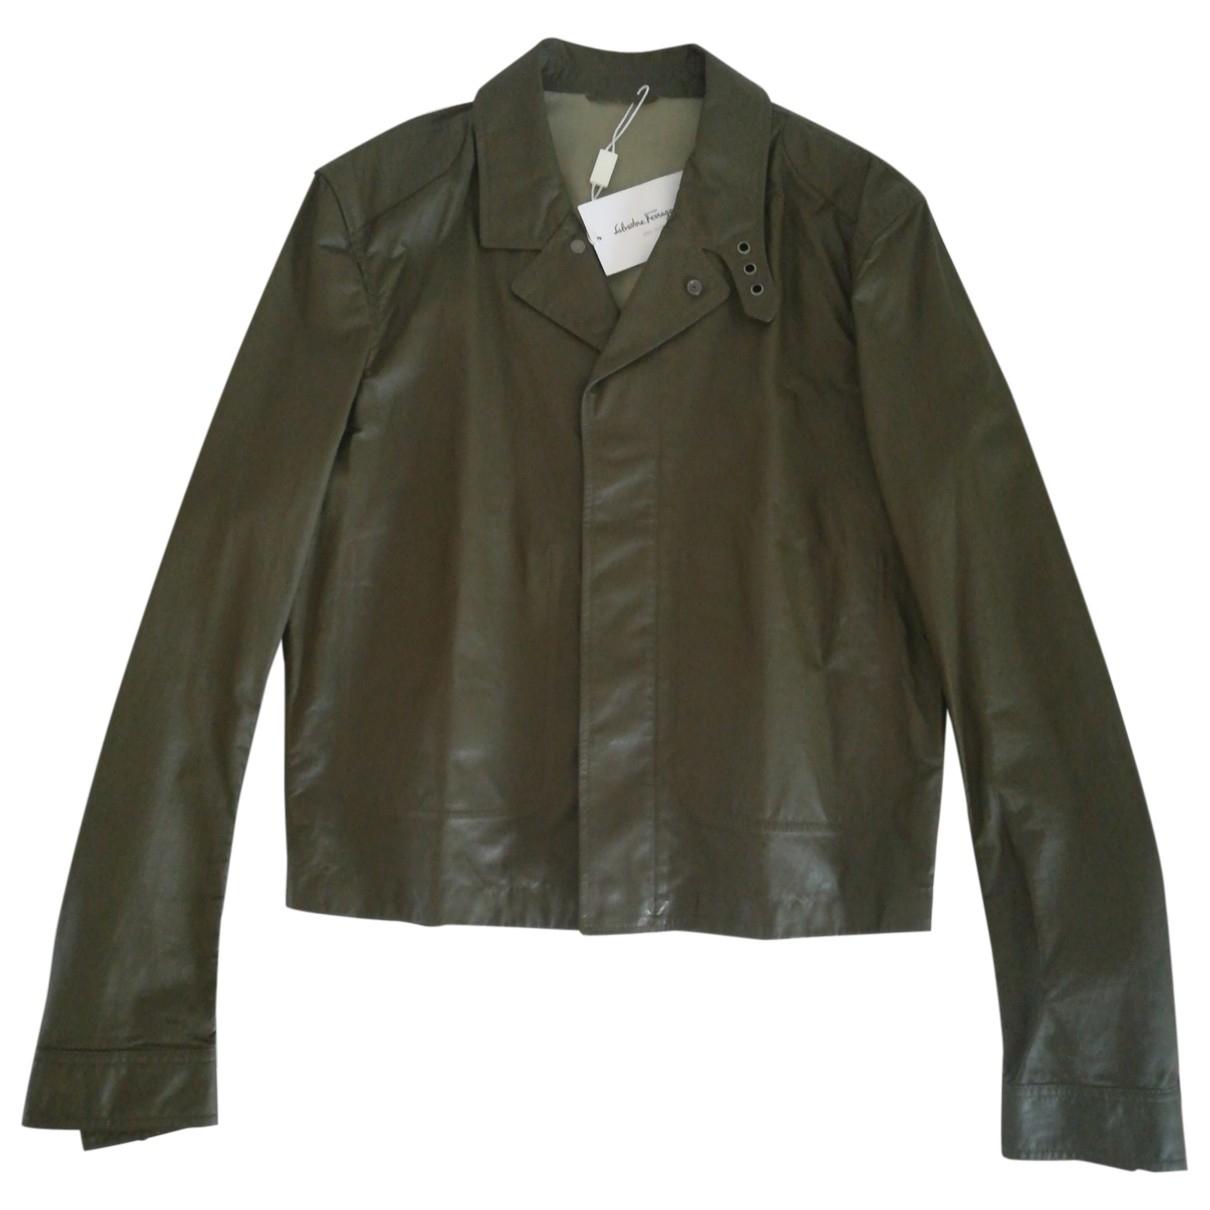 Salvatore Ferragamo \N Green Leather jacket  for Men M International